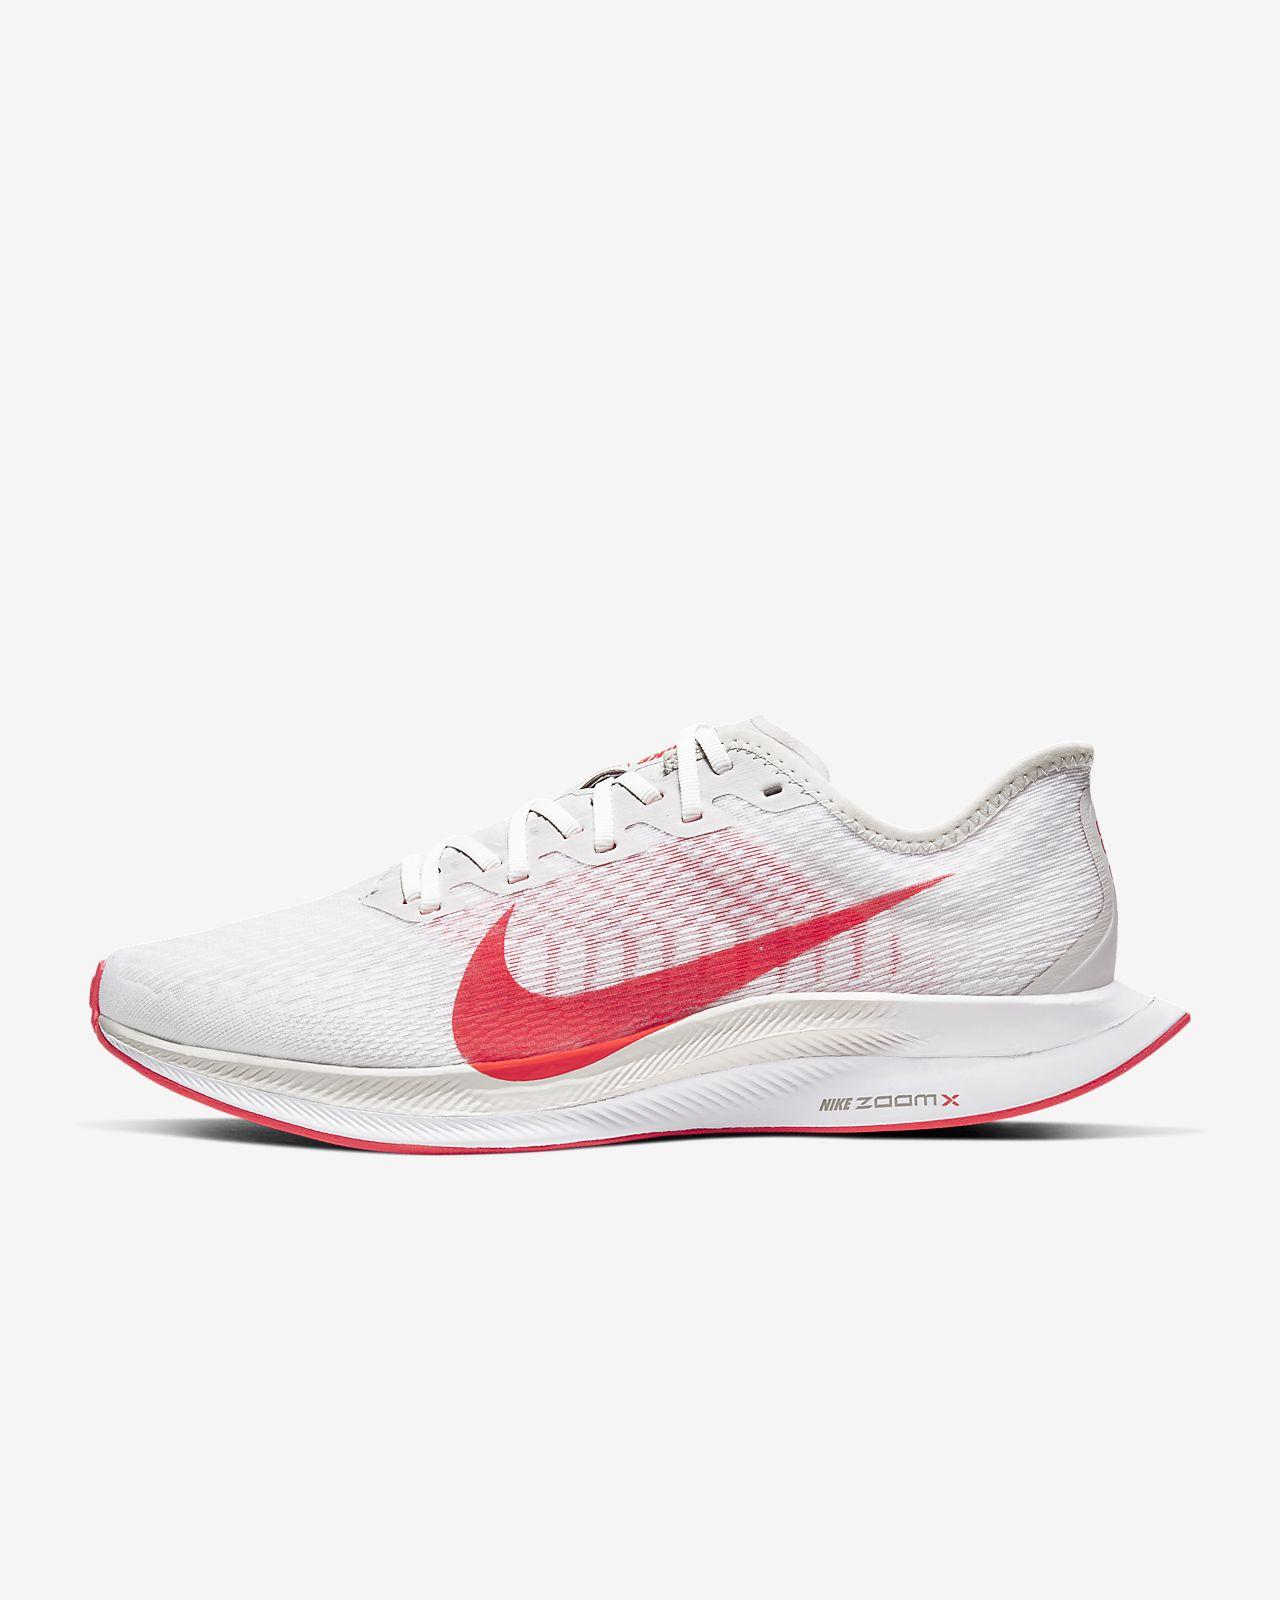 Chaussure de running Nike Zoom Pegasus Turbo 2 pour Homme